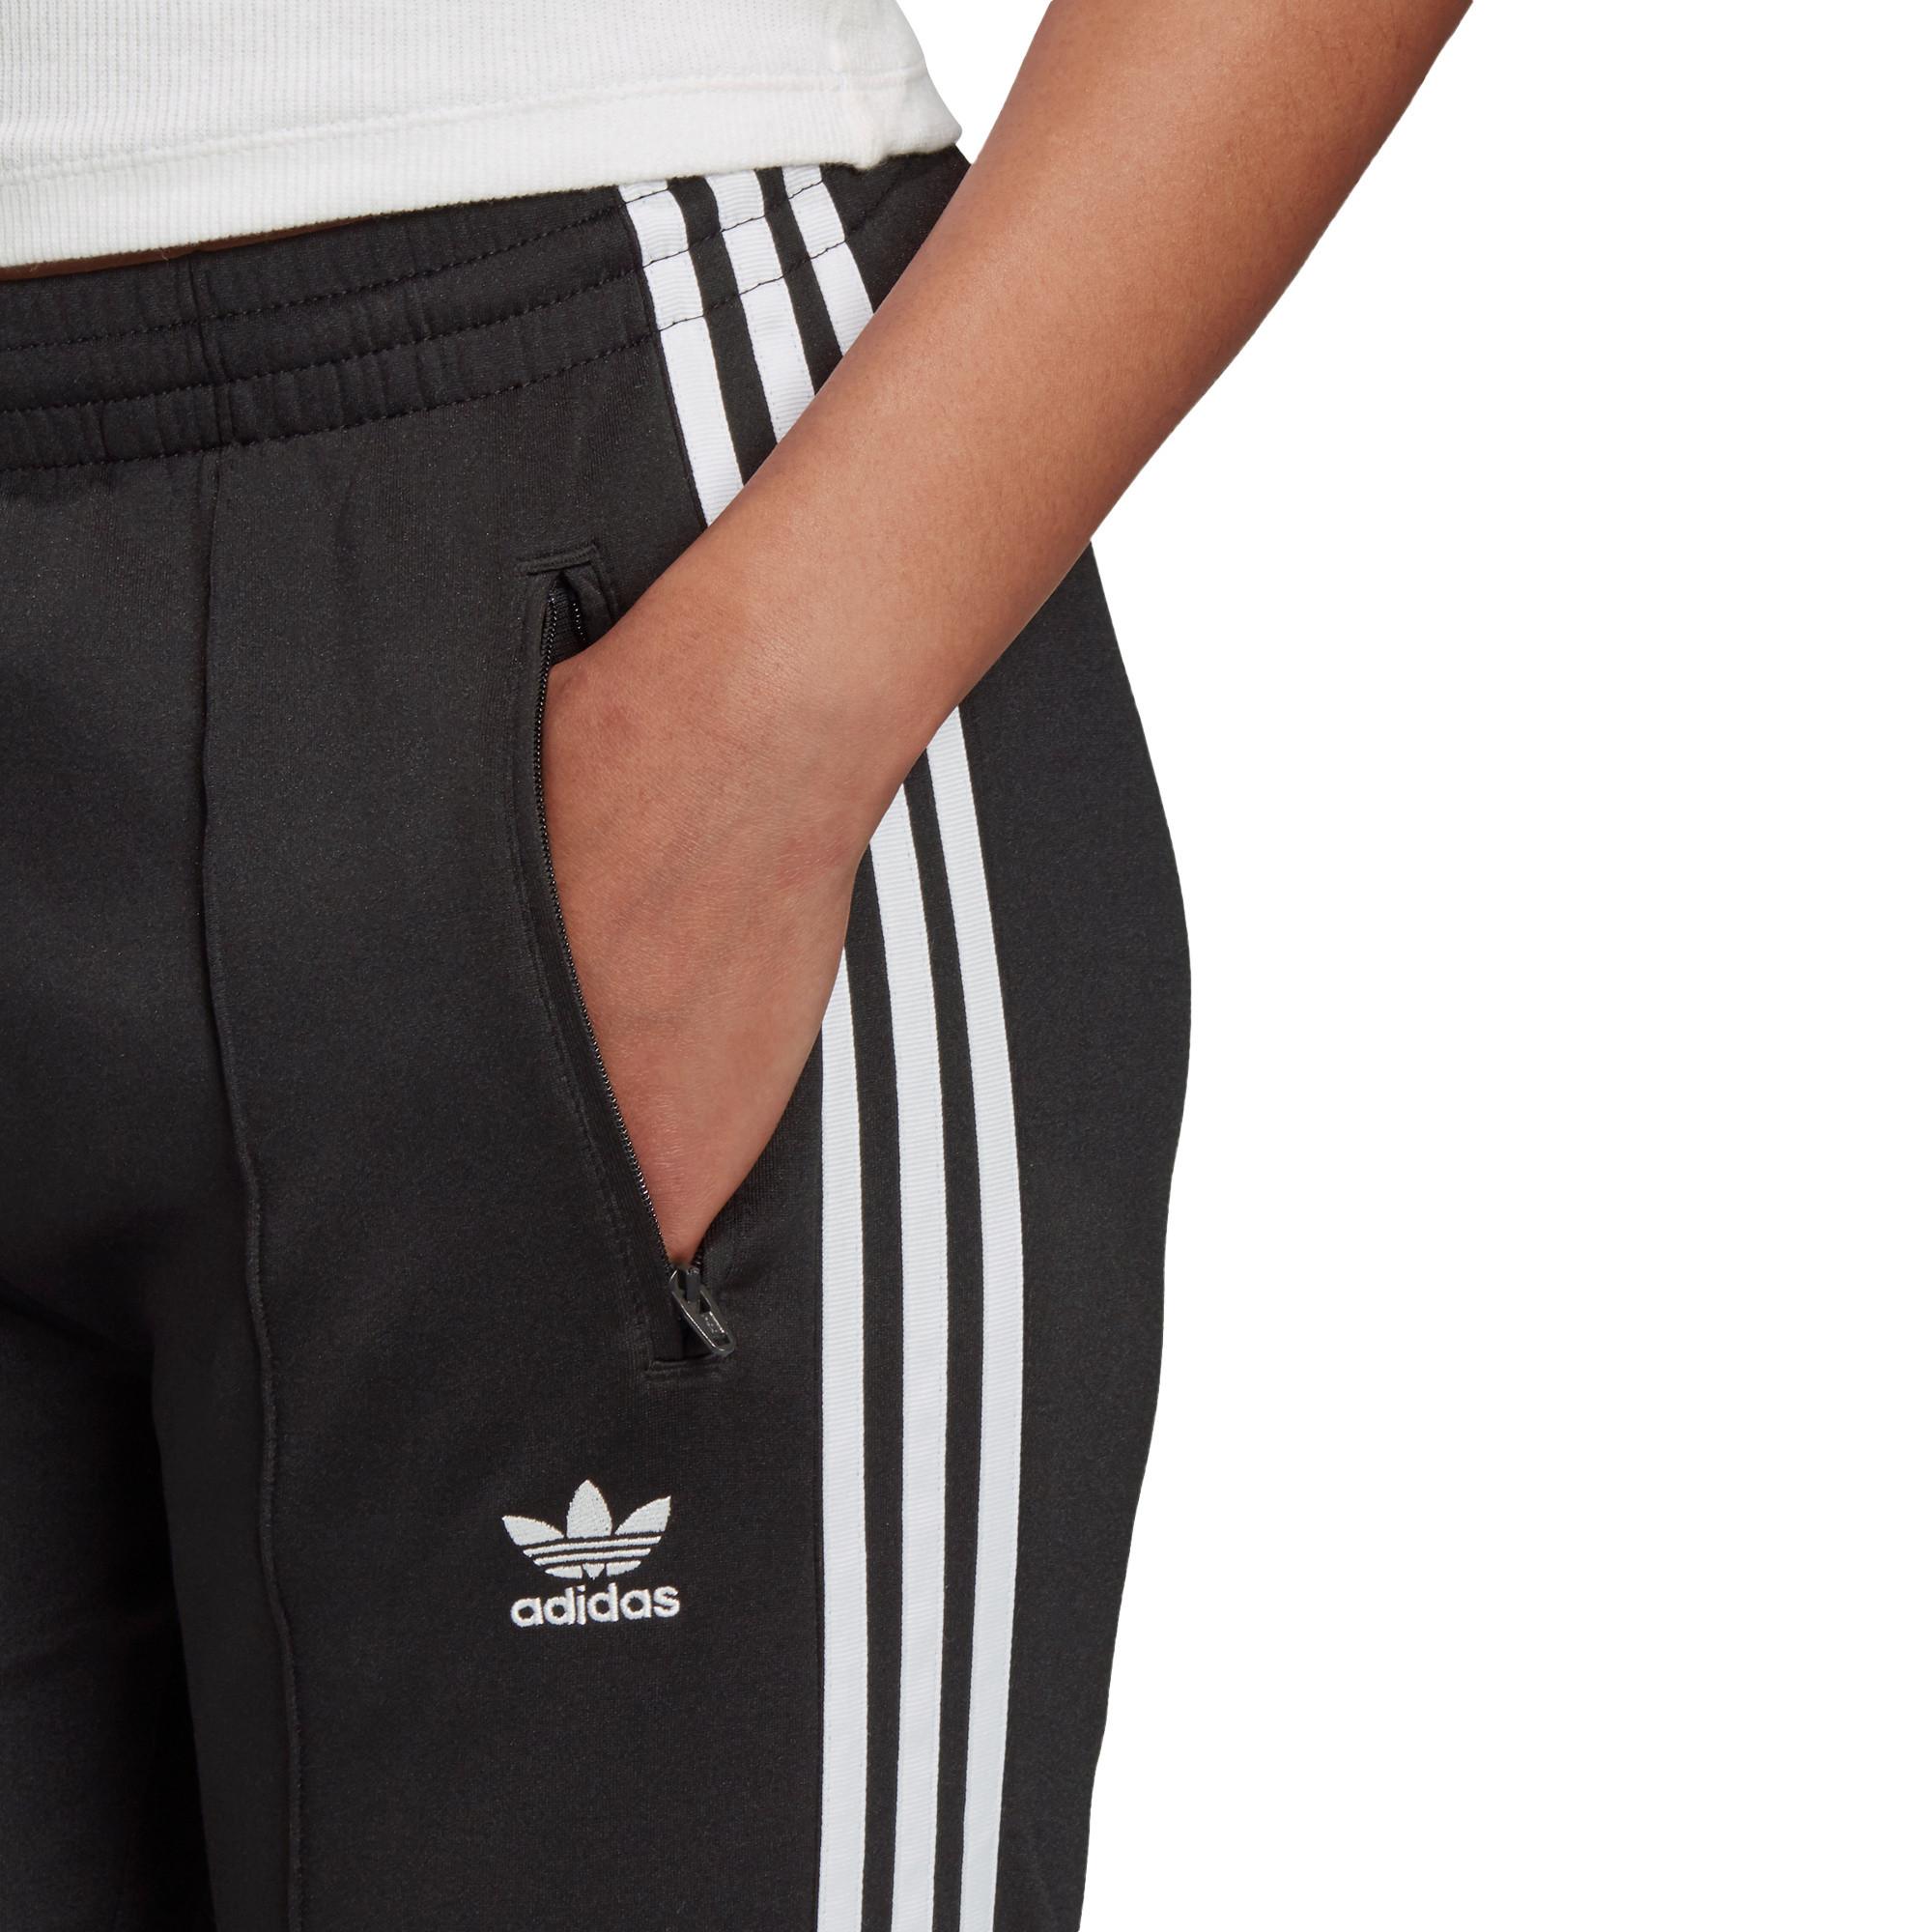 Pantaloni tuta Primeblue SST, Bianco/Nero, large image number 2